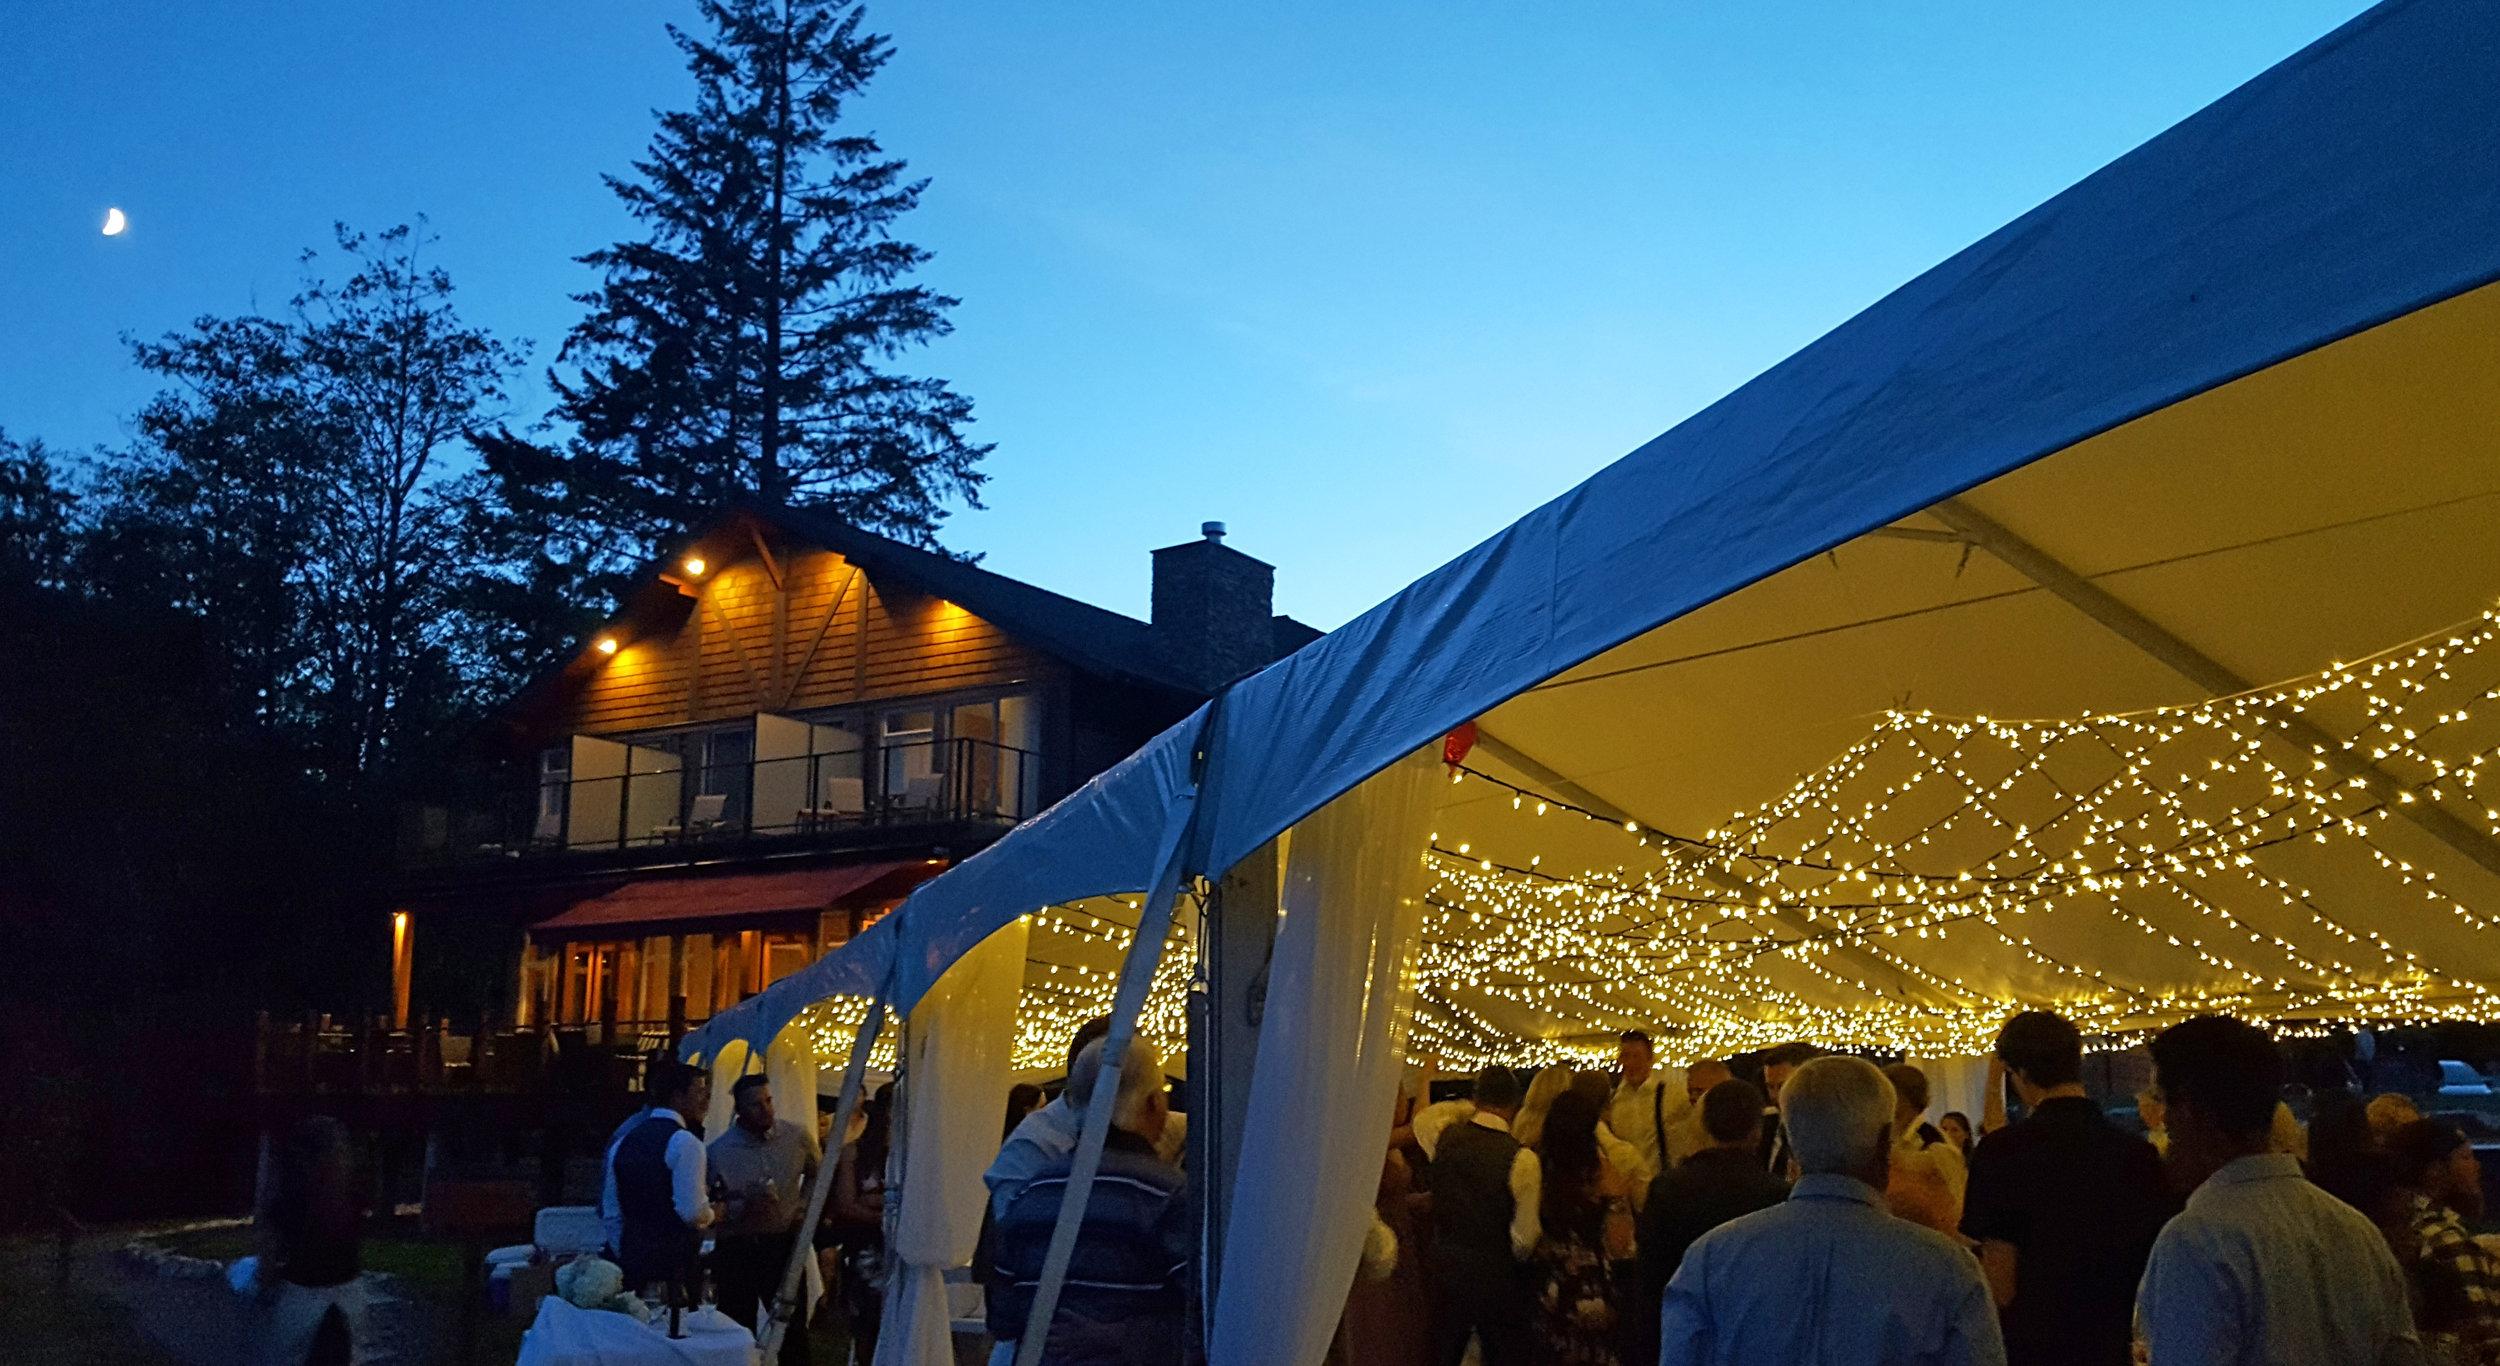 eve wedding tent  213349.jpg